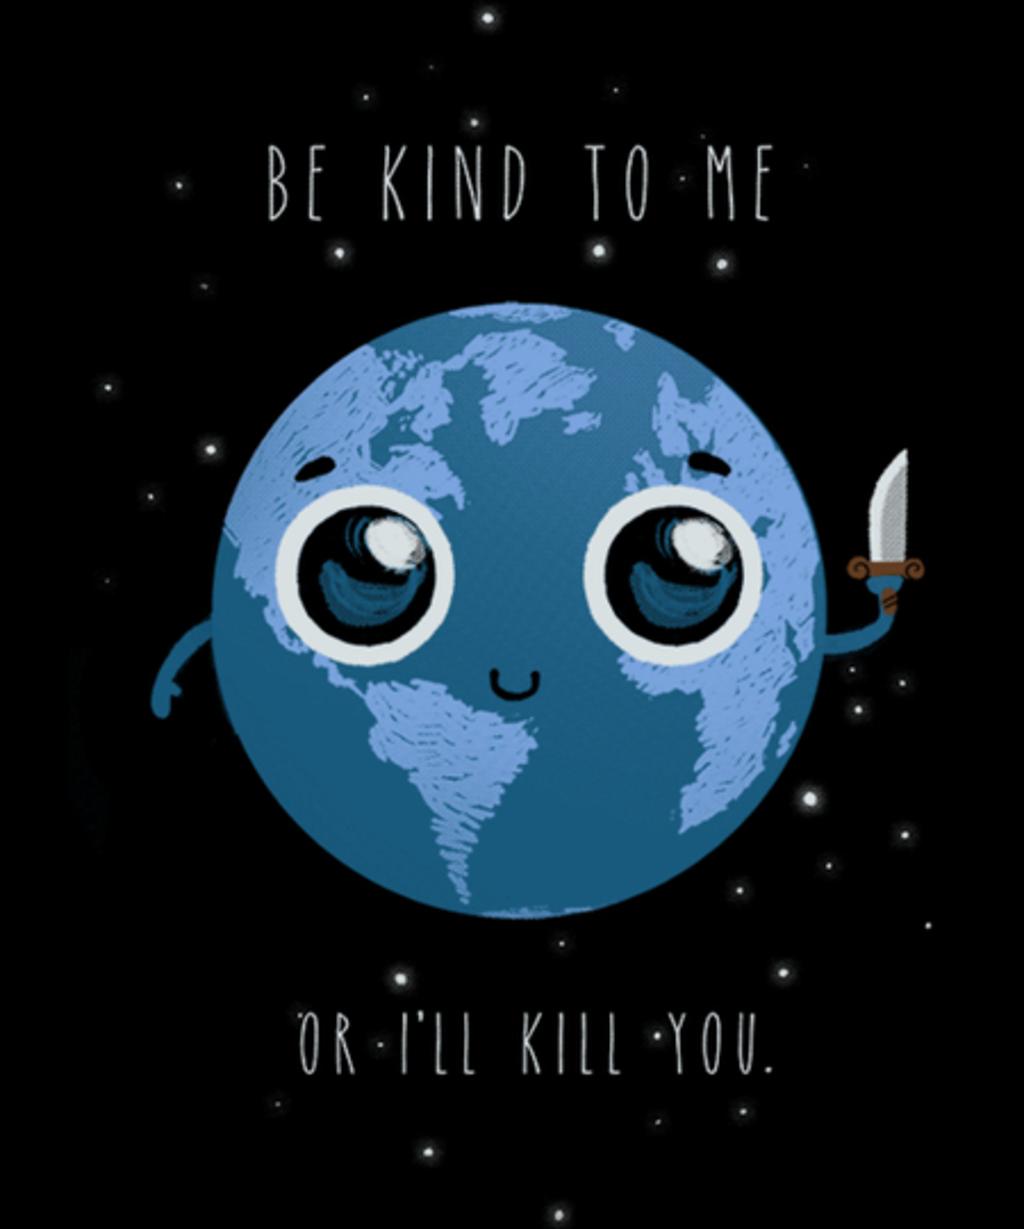 Qwertee: Be kind, or I'll kill you.